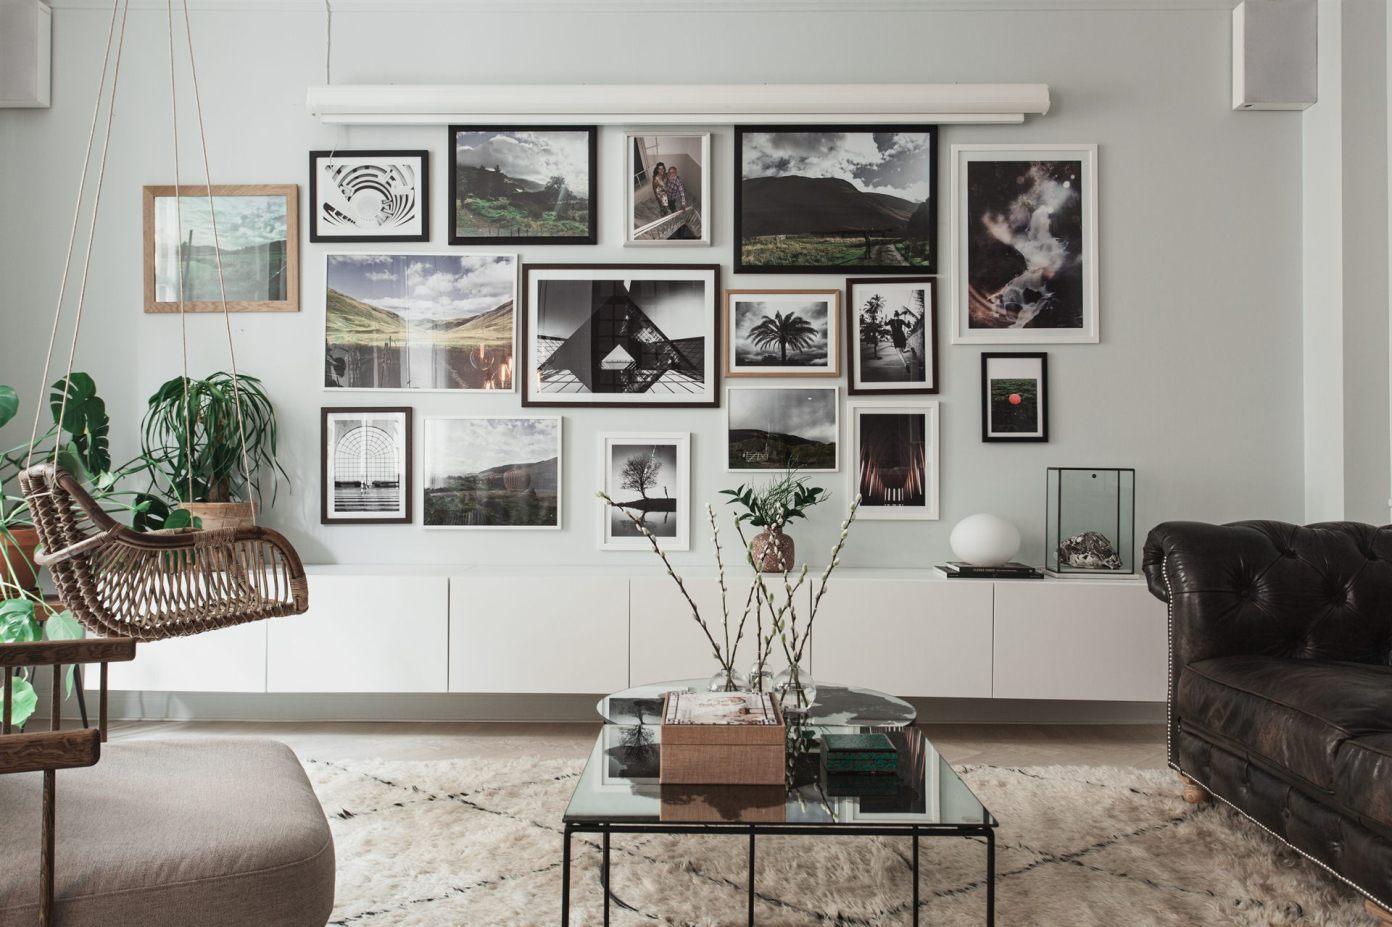 квартира 67 квм гостиная картины комод стена